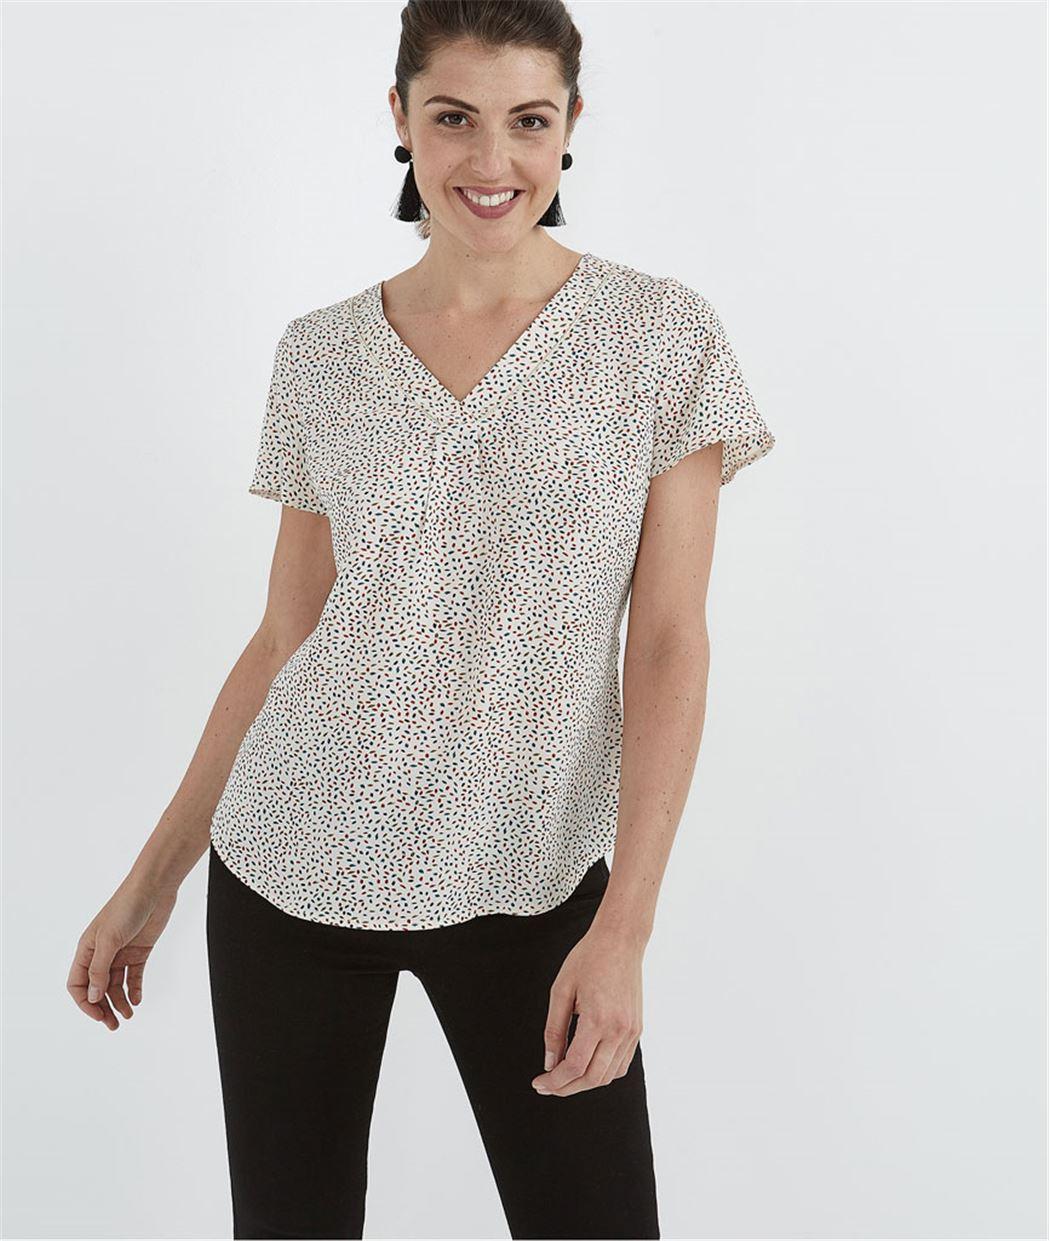 Blouse femme imprimé minimaliste IMPRIME